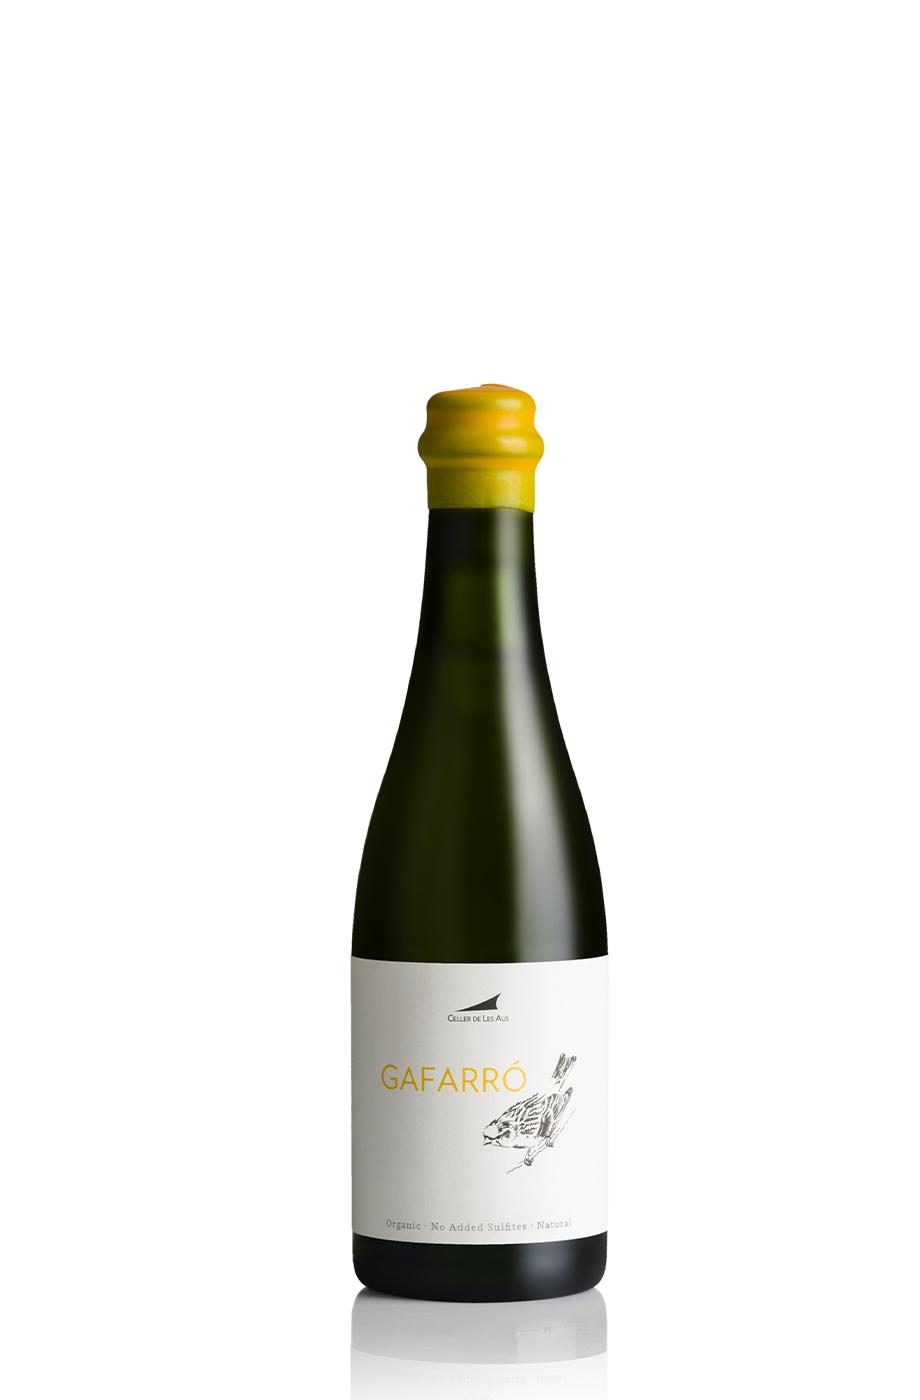 AA Gafarró | Celler de Les Aus - Winexfood